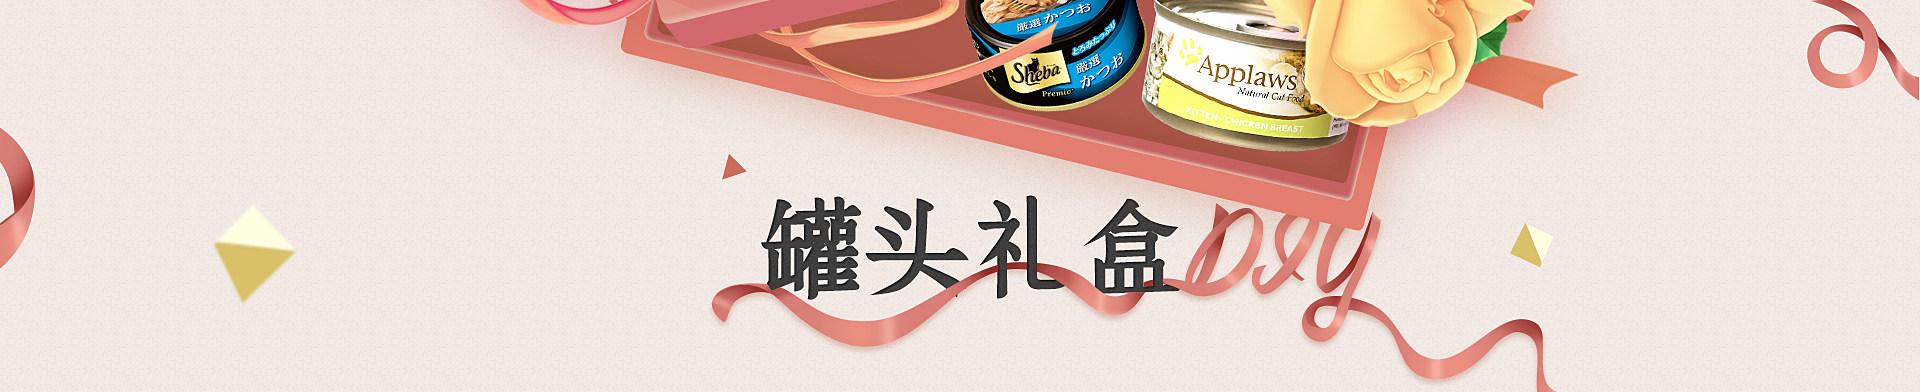 罐头超市-罐头礼盒banner